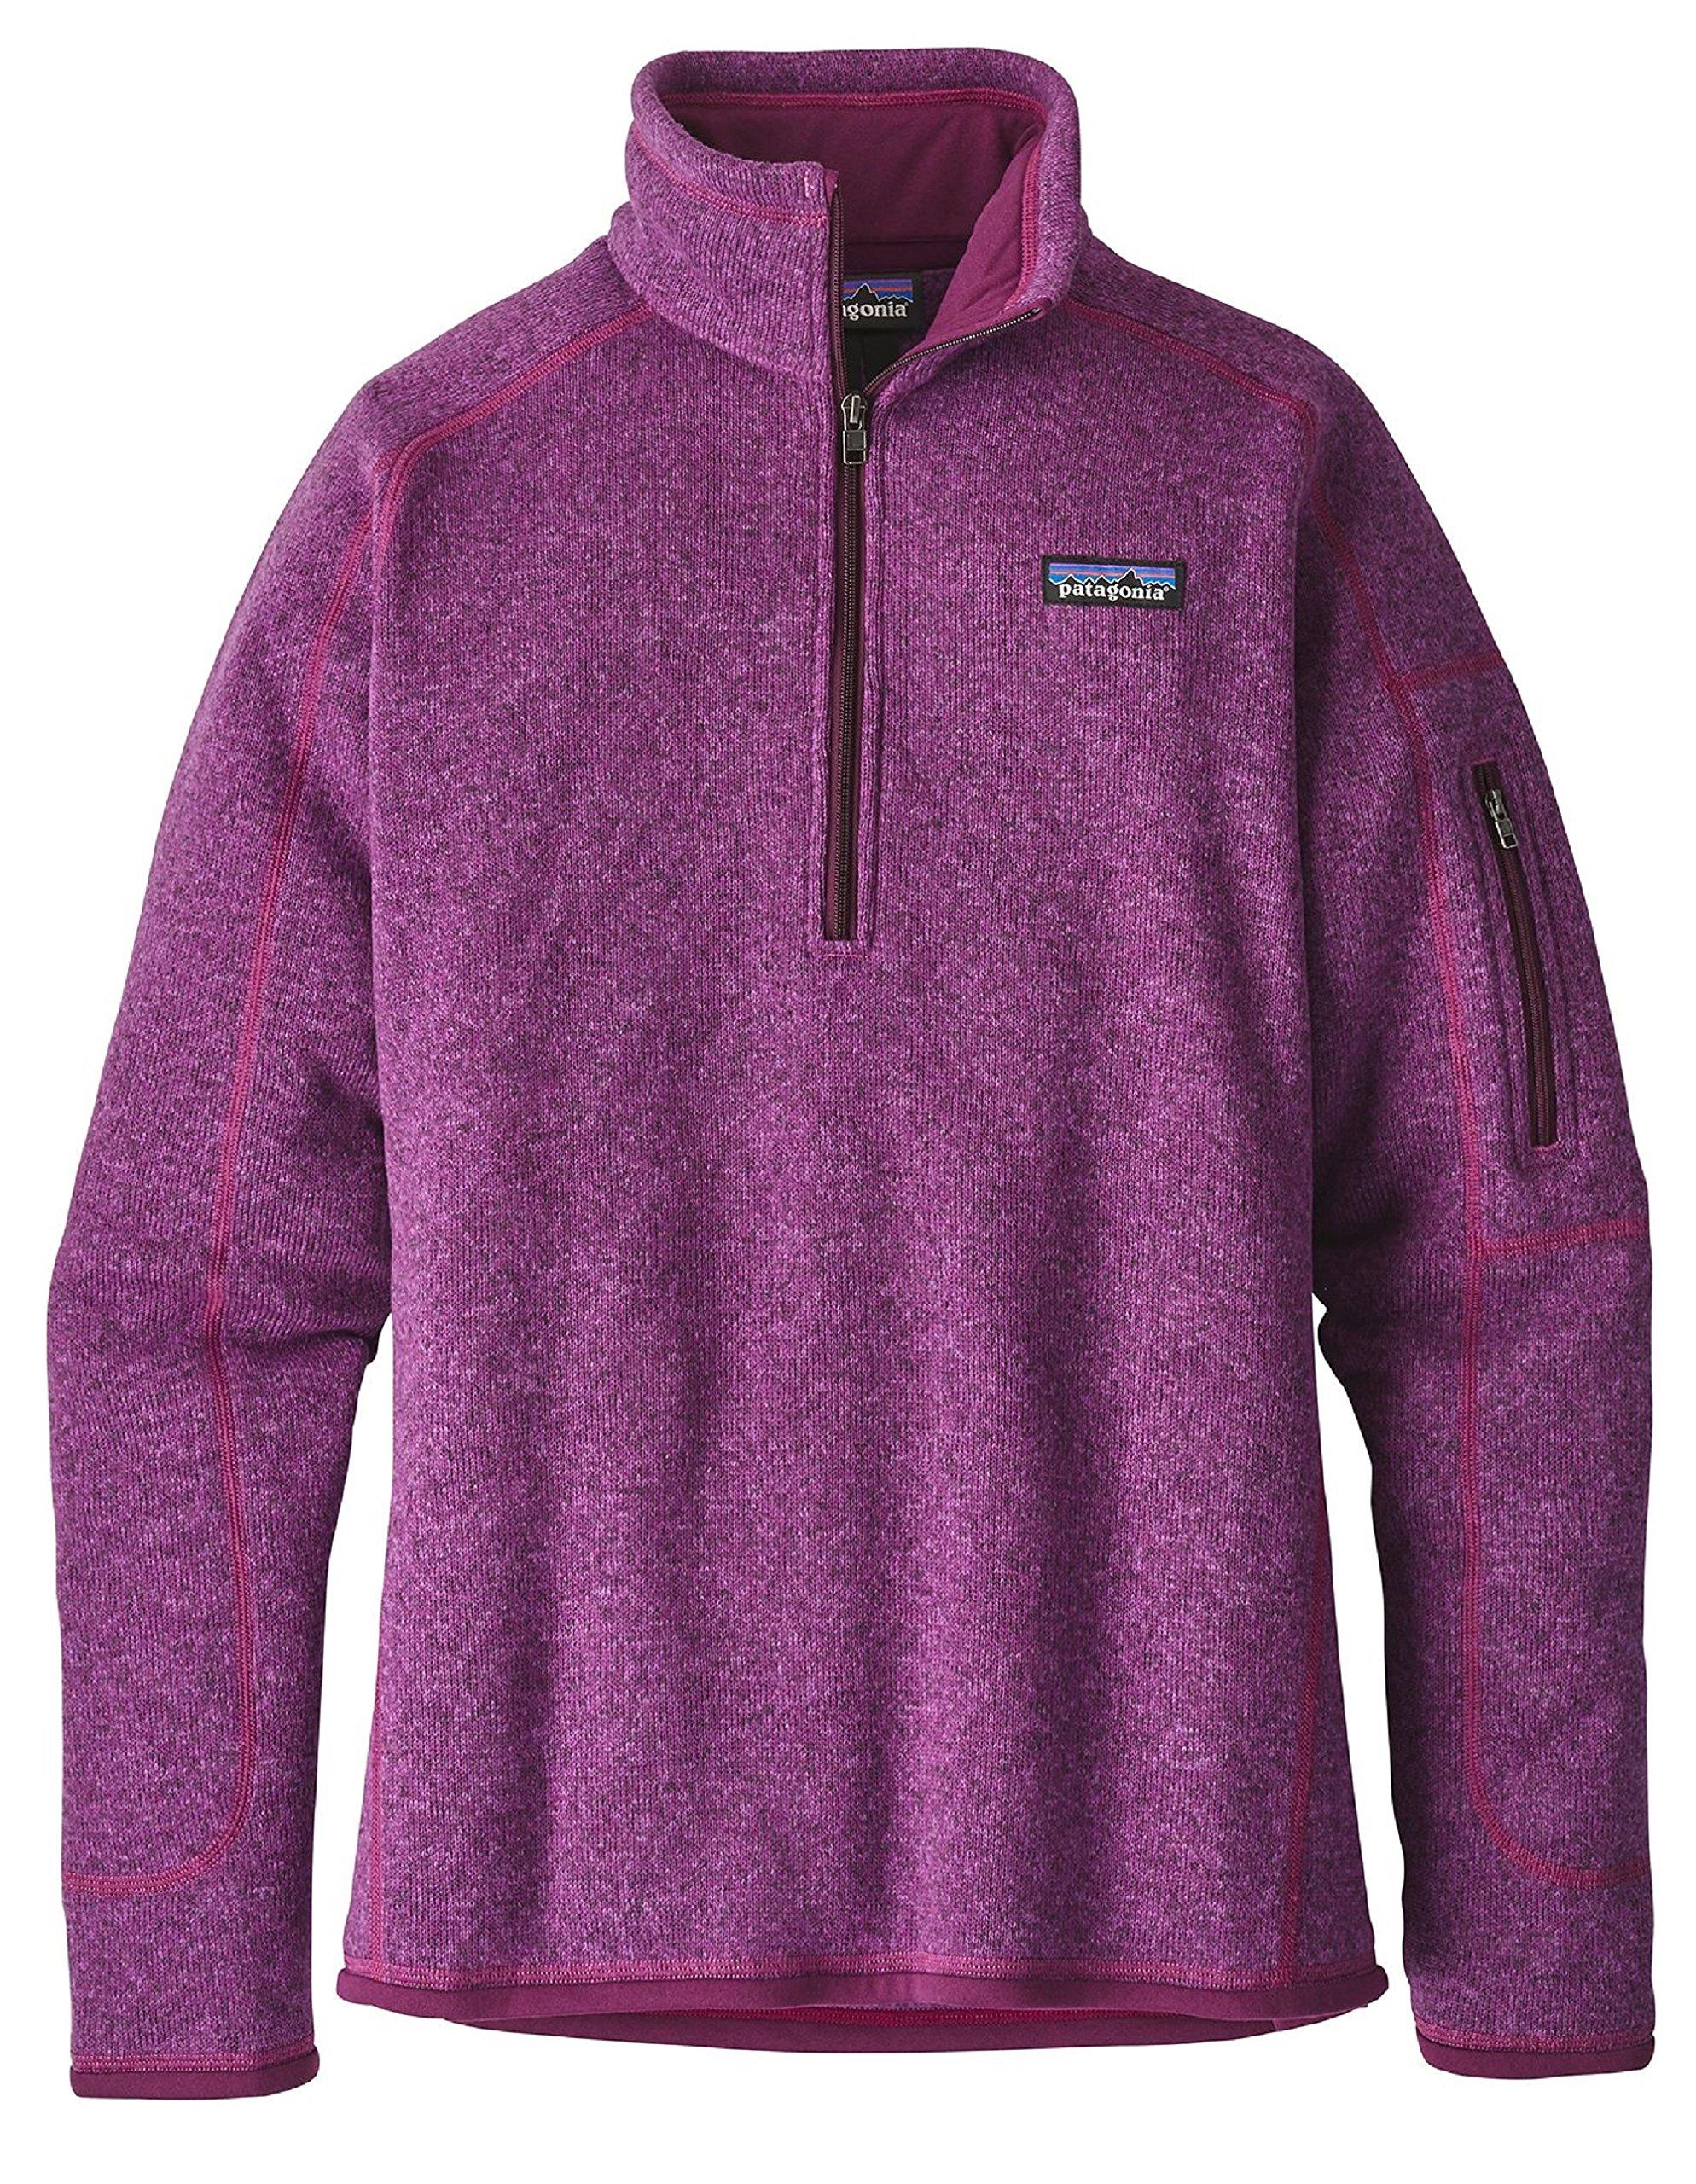 Patagonia Womens Better Sweater 1/4 Zip 25617 (Small, Ikat Purple)